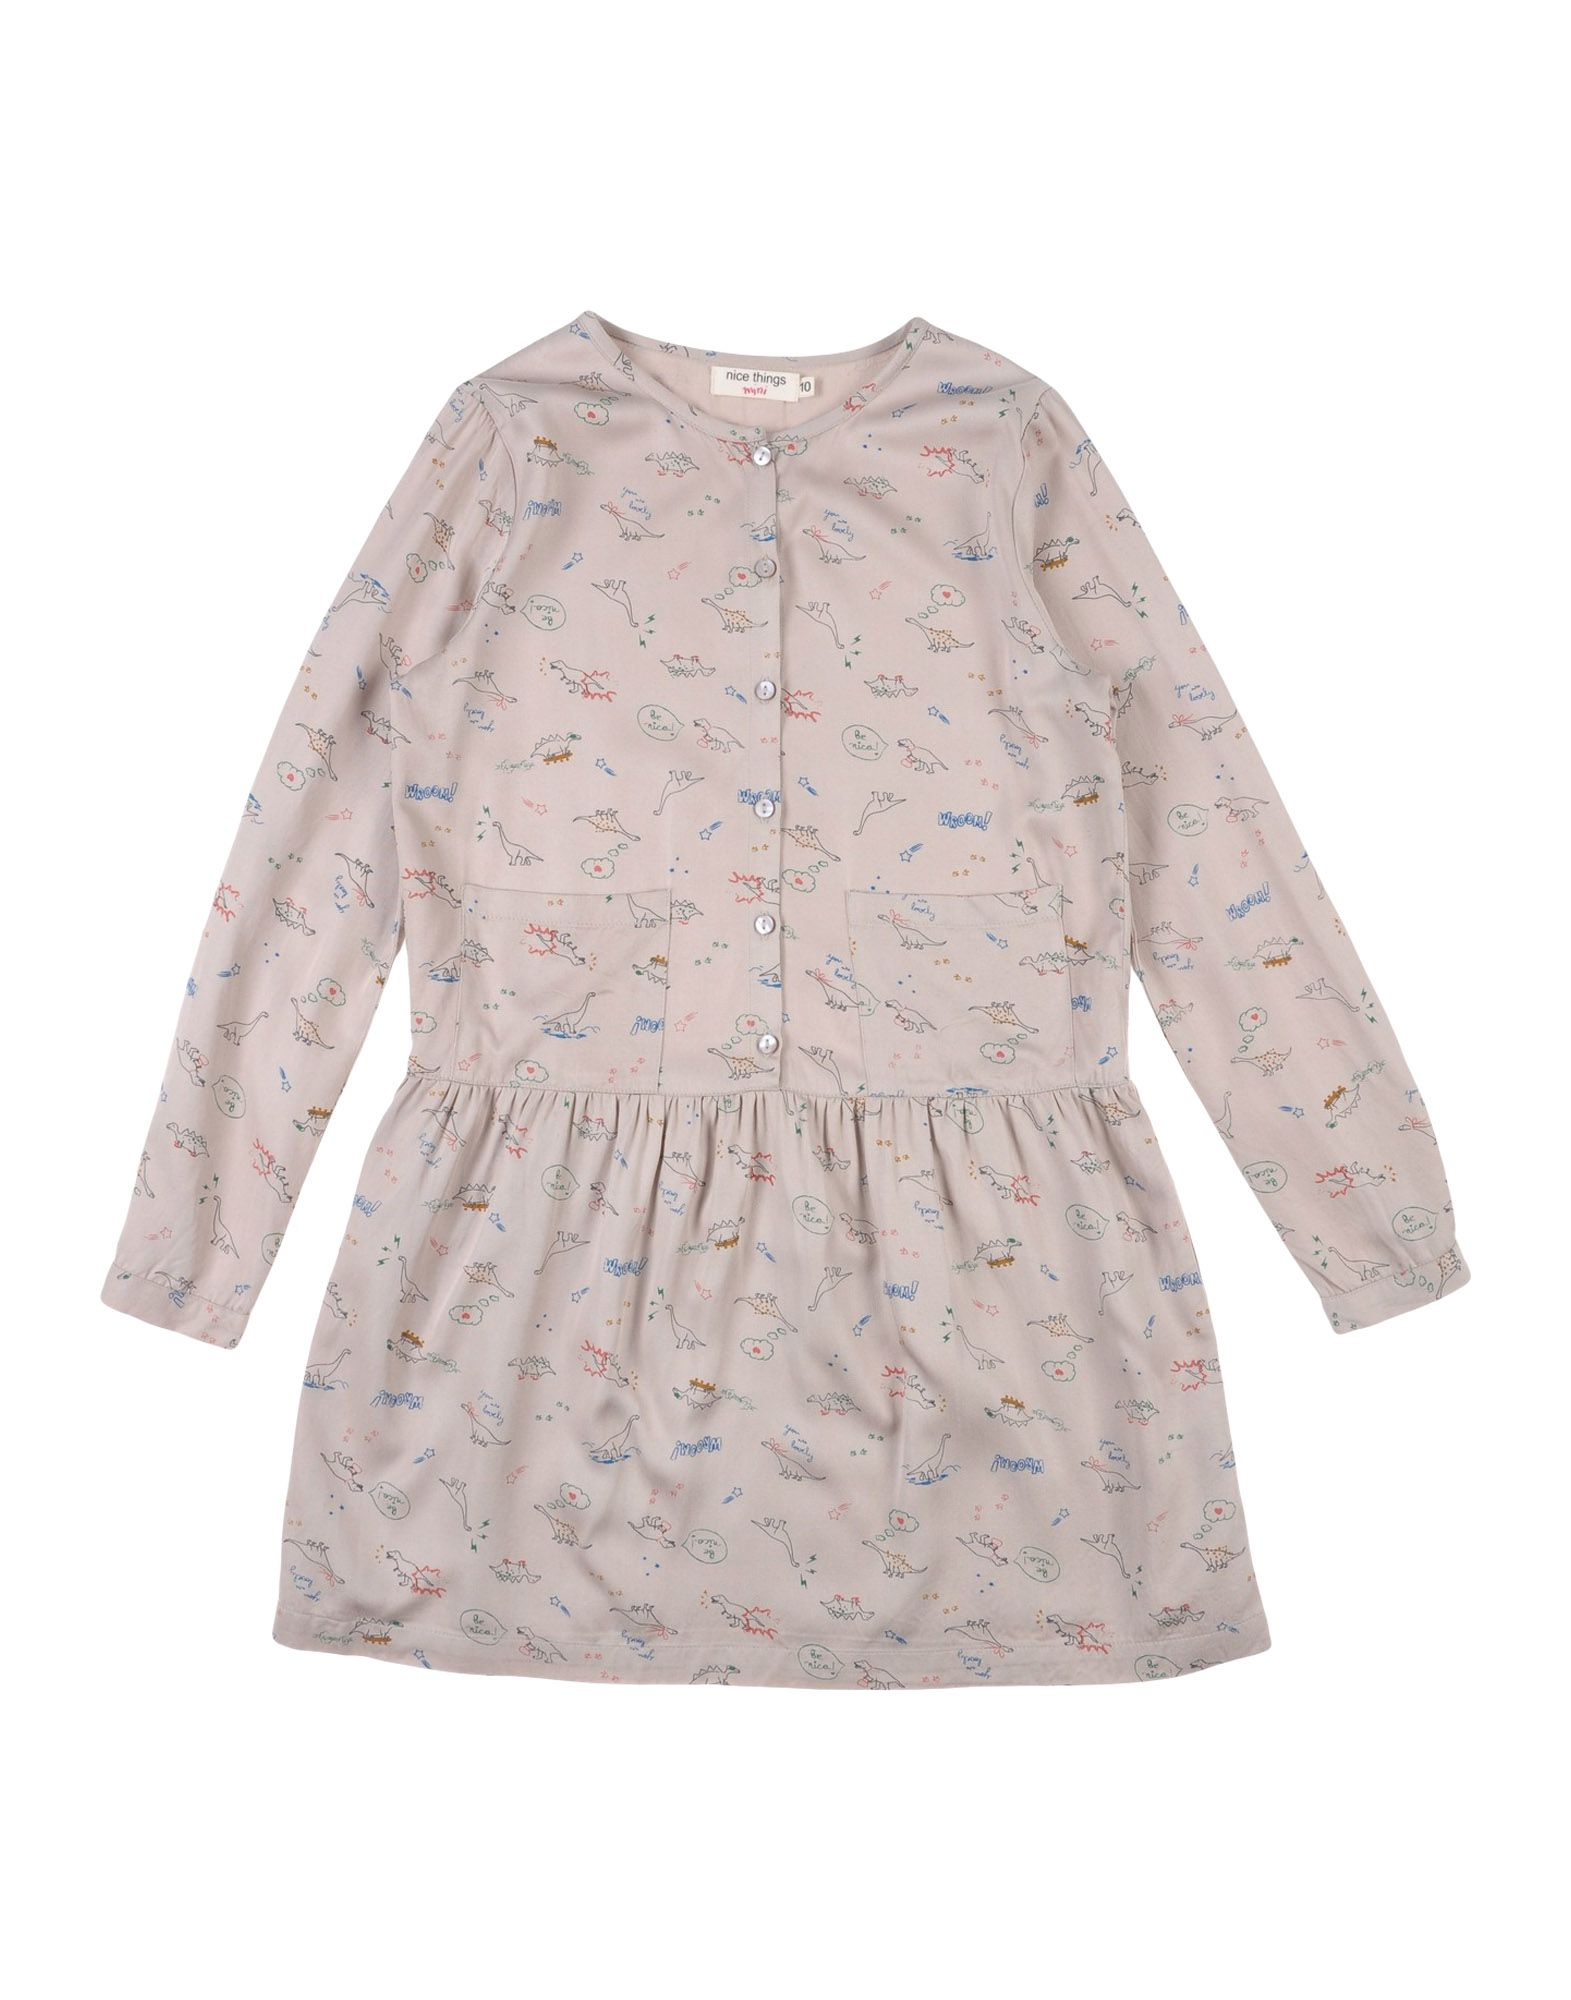 NICE THINGS MINI Dresses